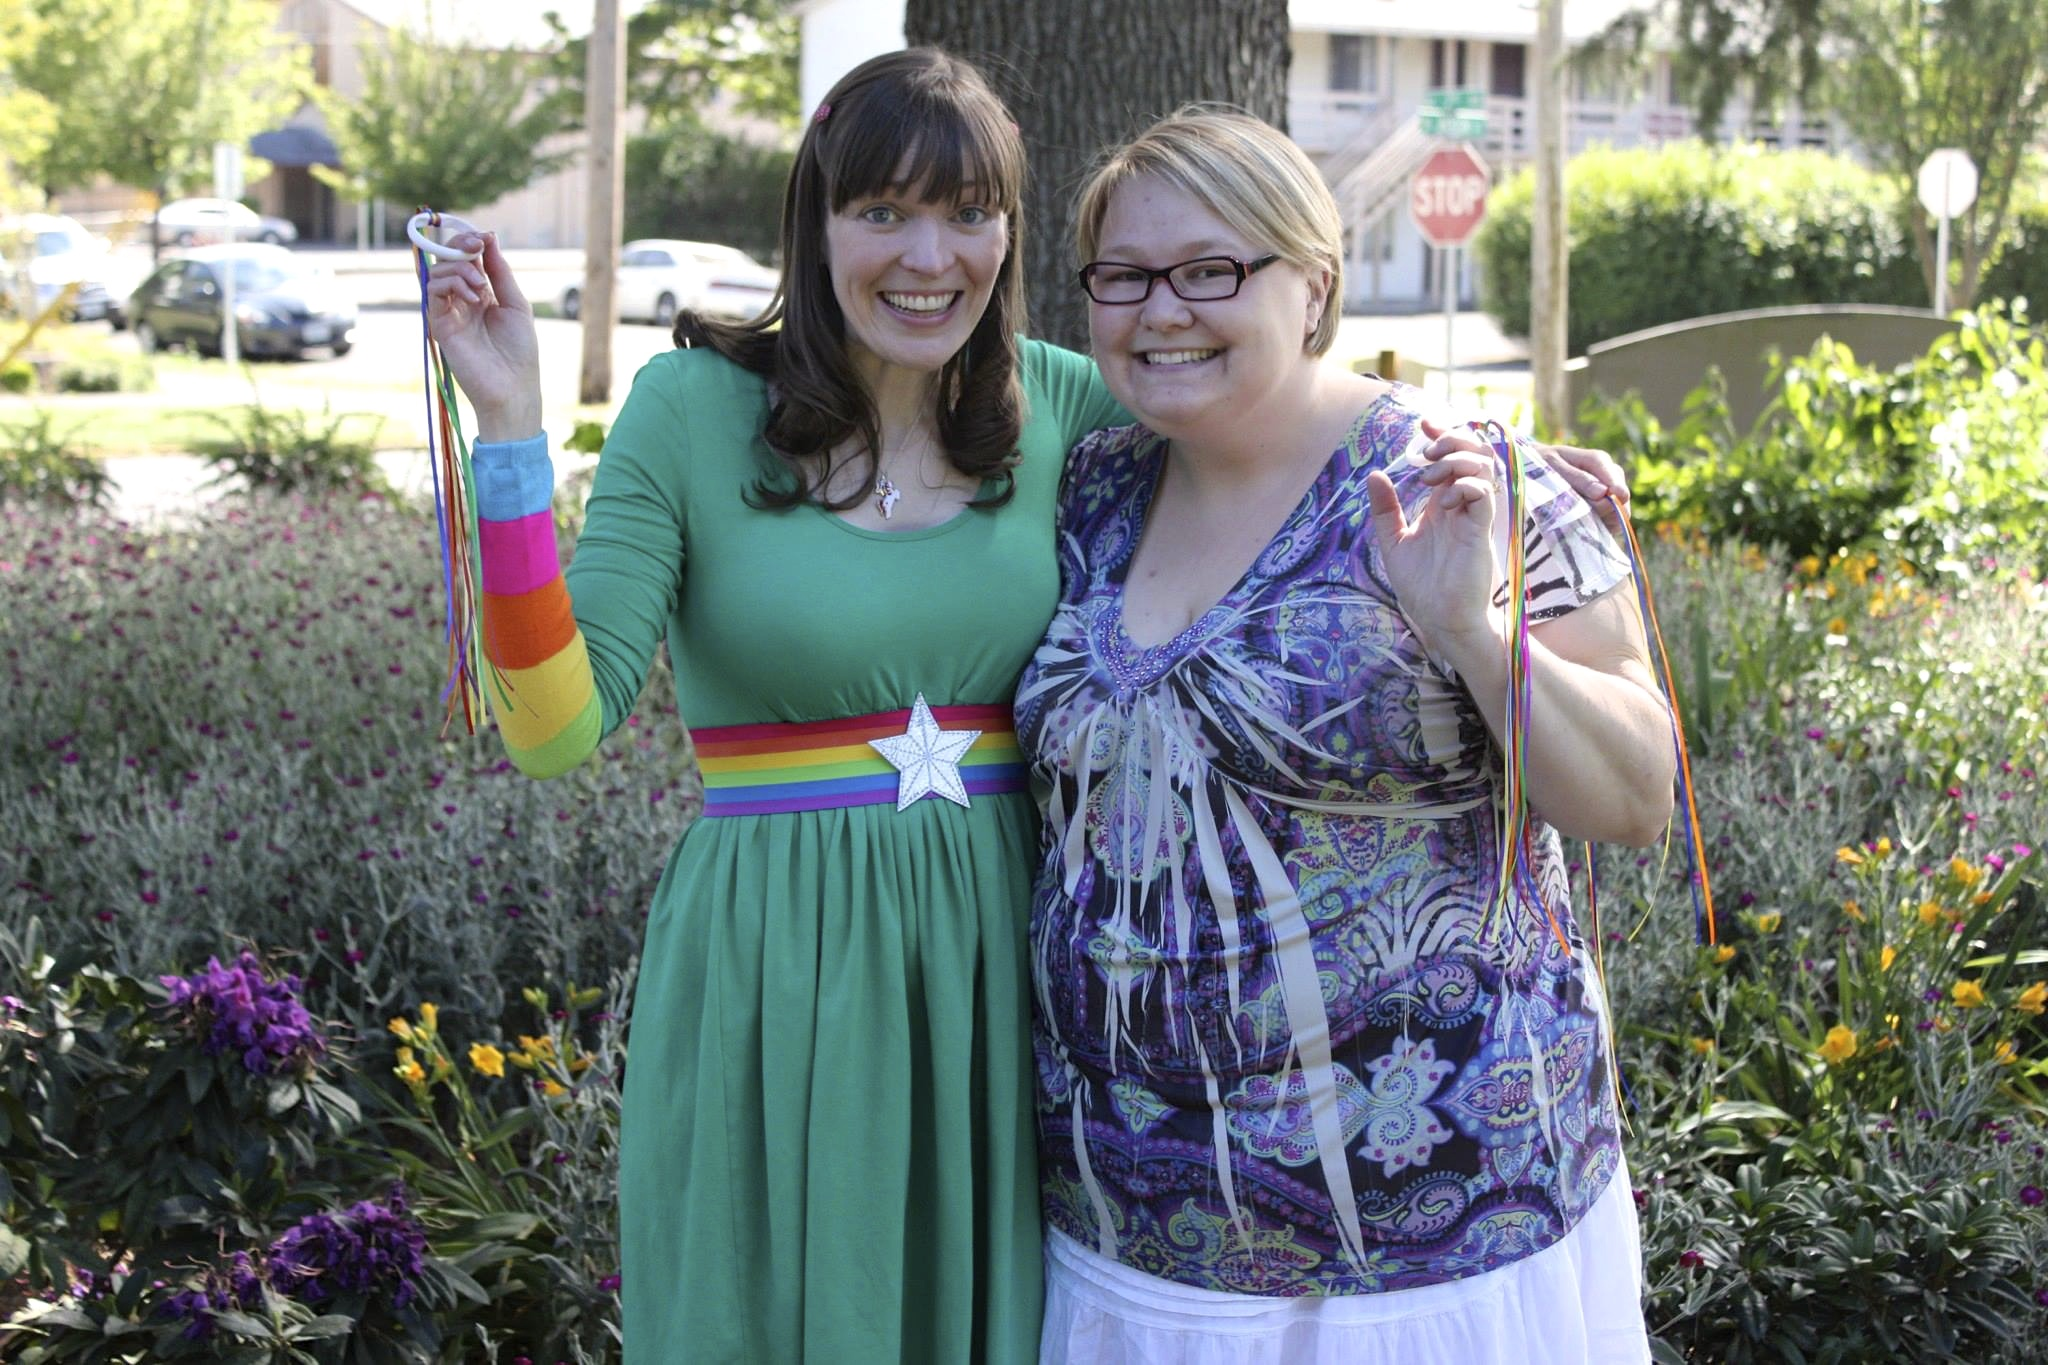 Rachel and Emmy